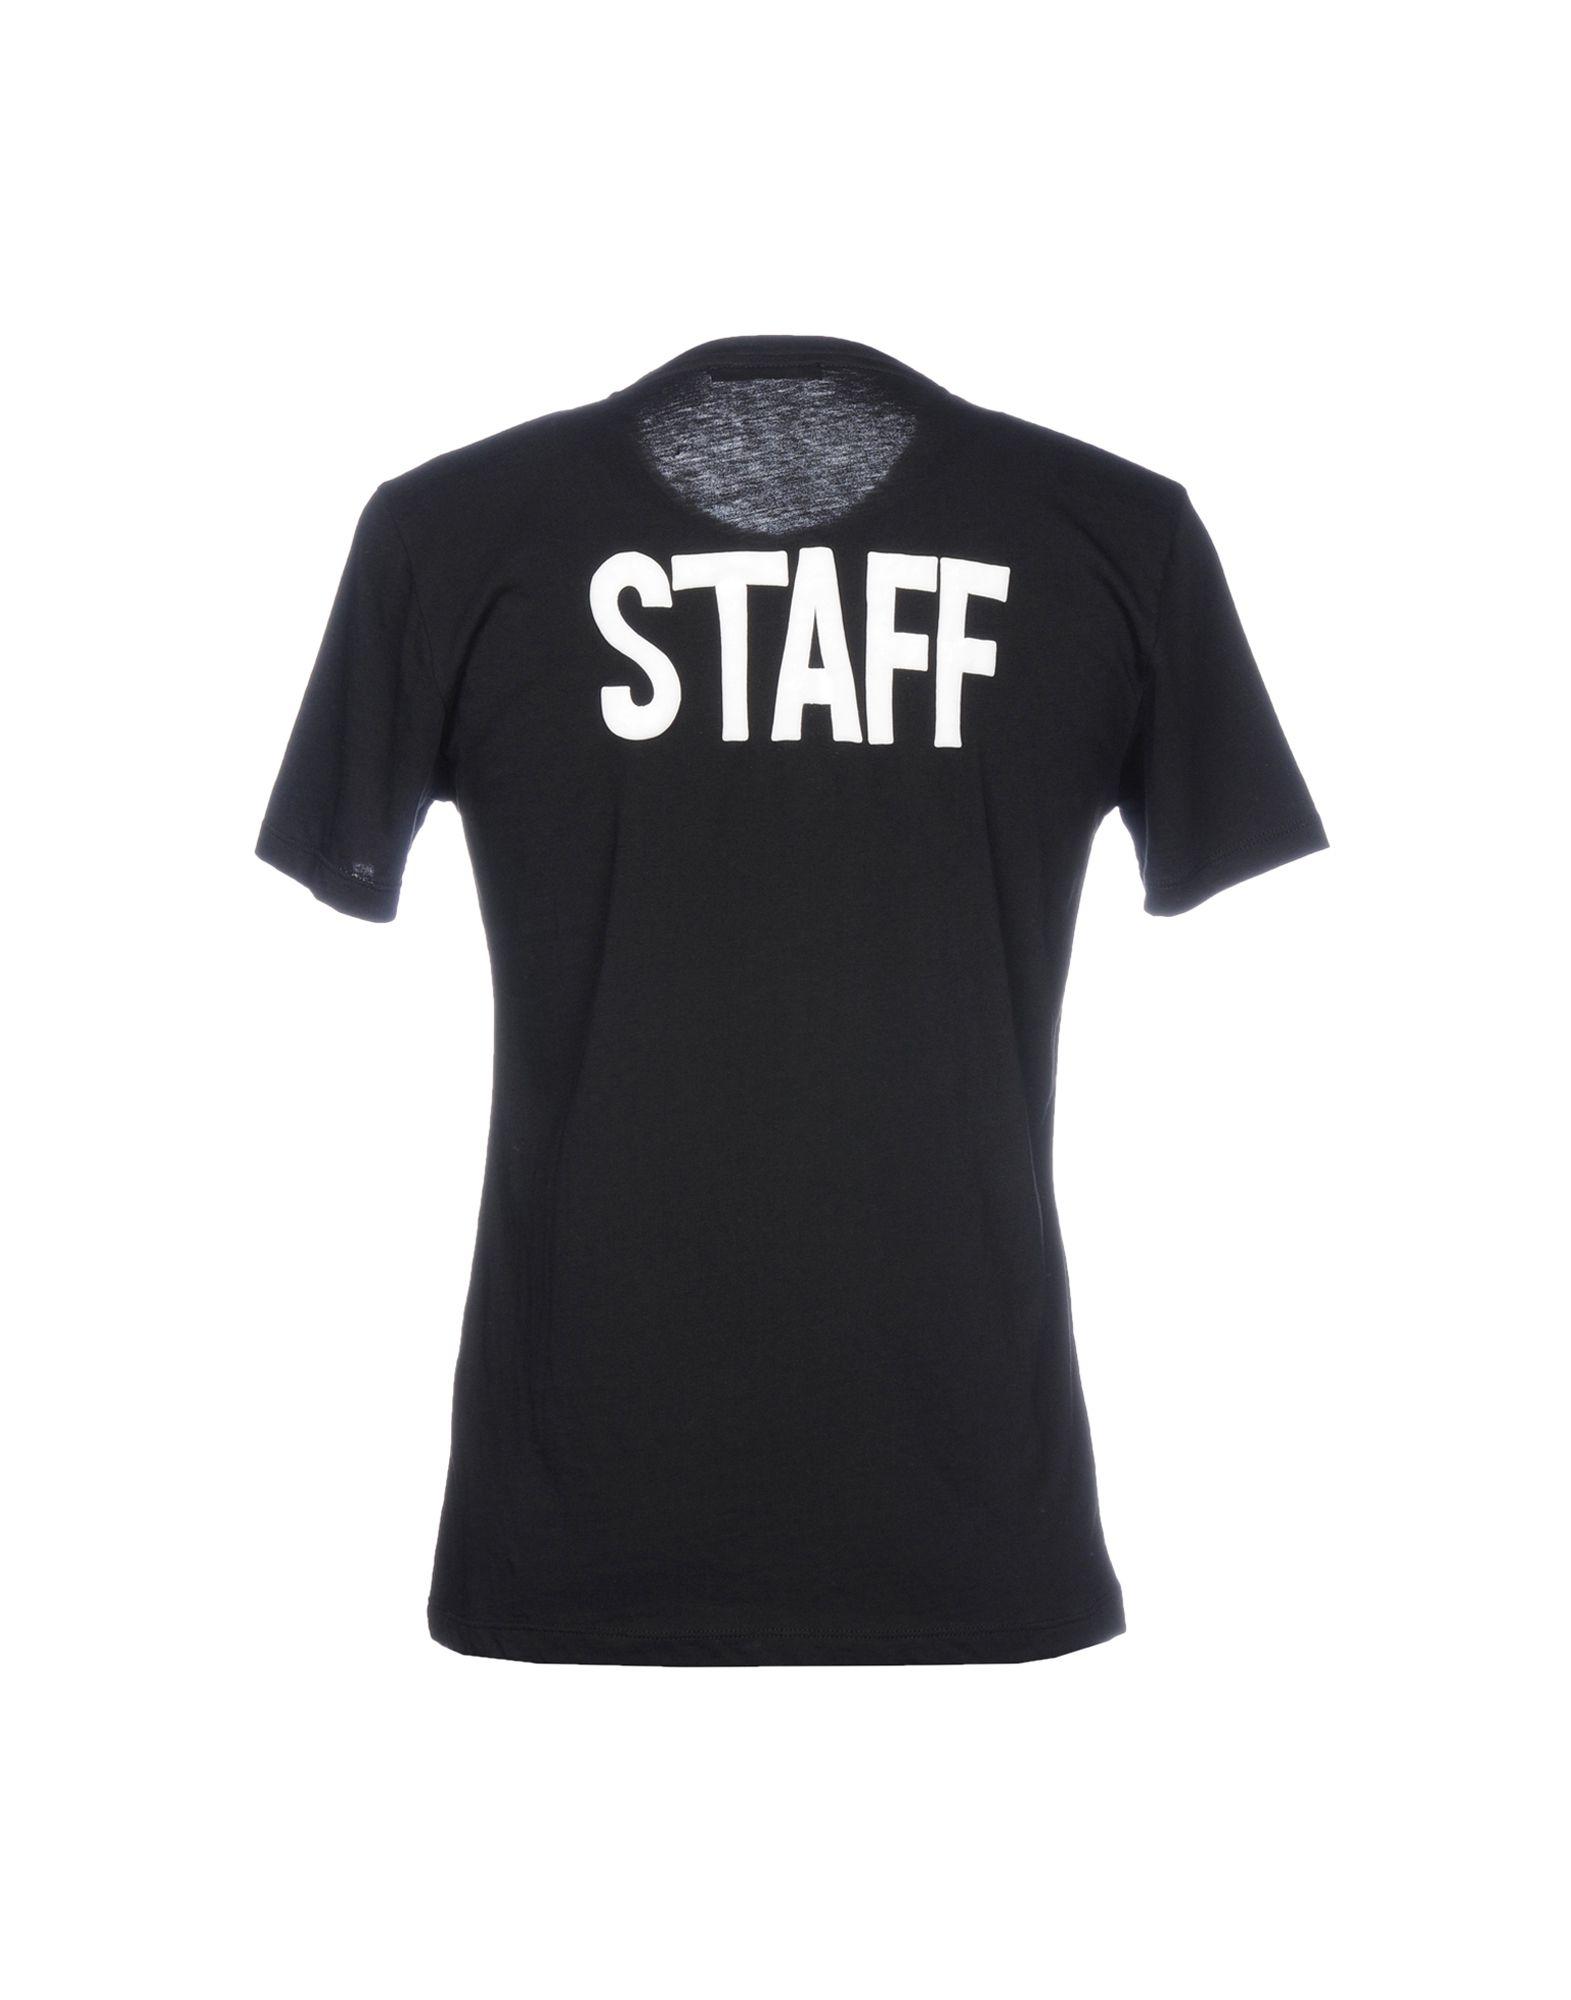 A buon mercato buon A buon mercato mercato T-Shirt Berna Uomo - 12196908SV ba16c9